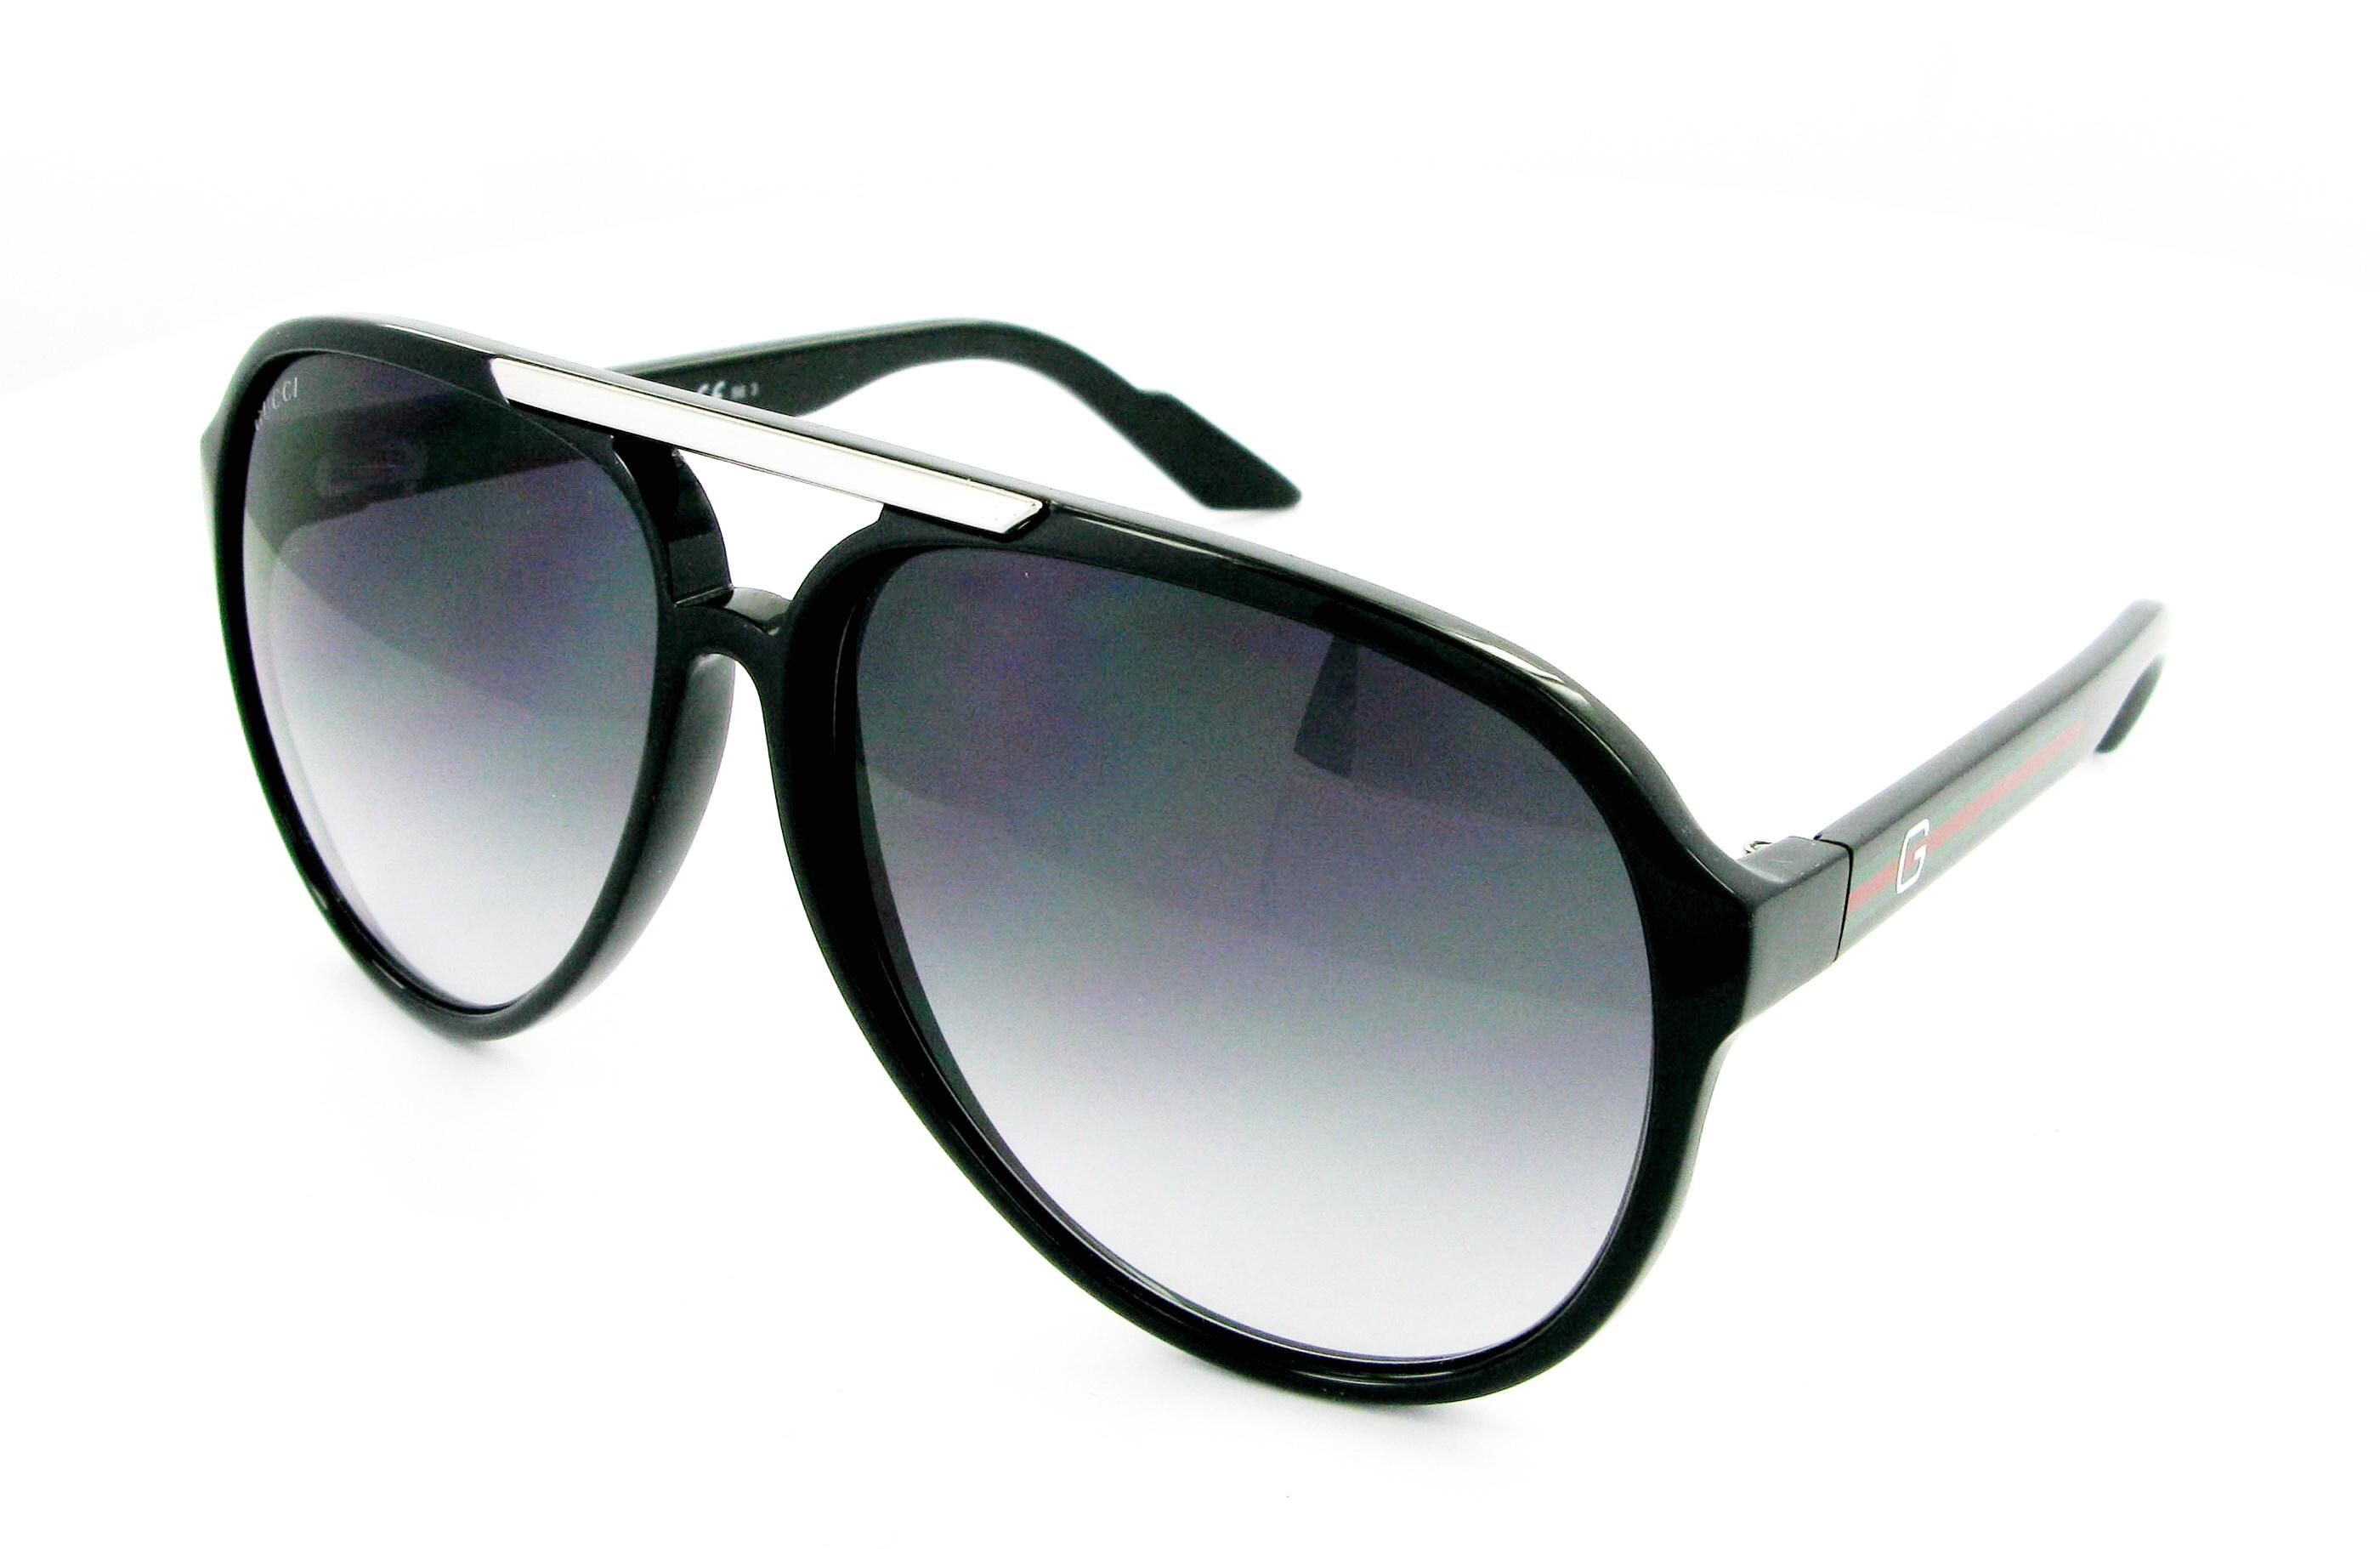 lunette solaire lunette gucci homme. Black Bedroom Furniture Sets. Home Design Ideas